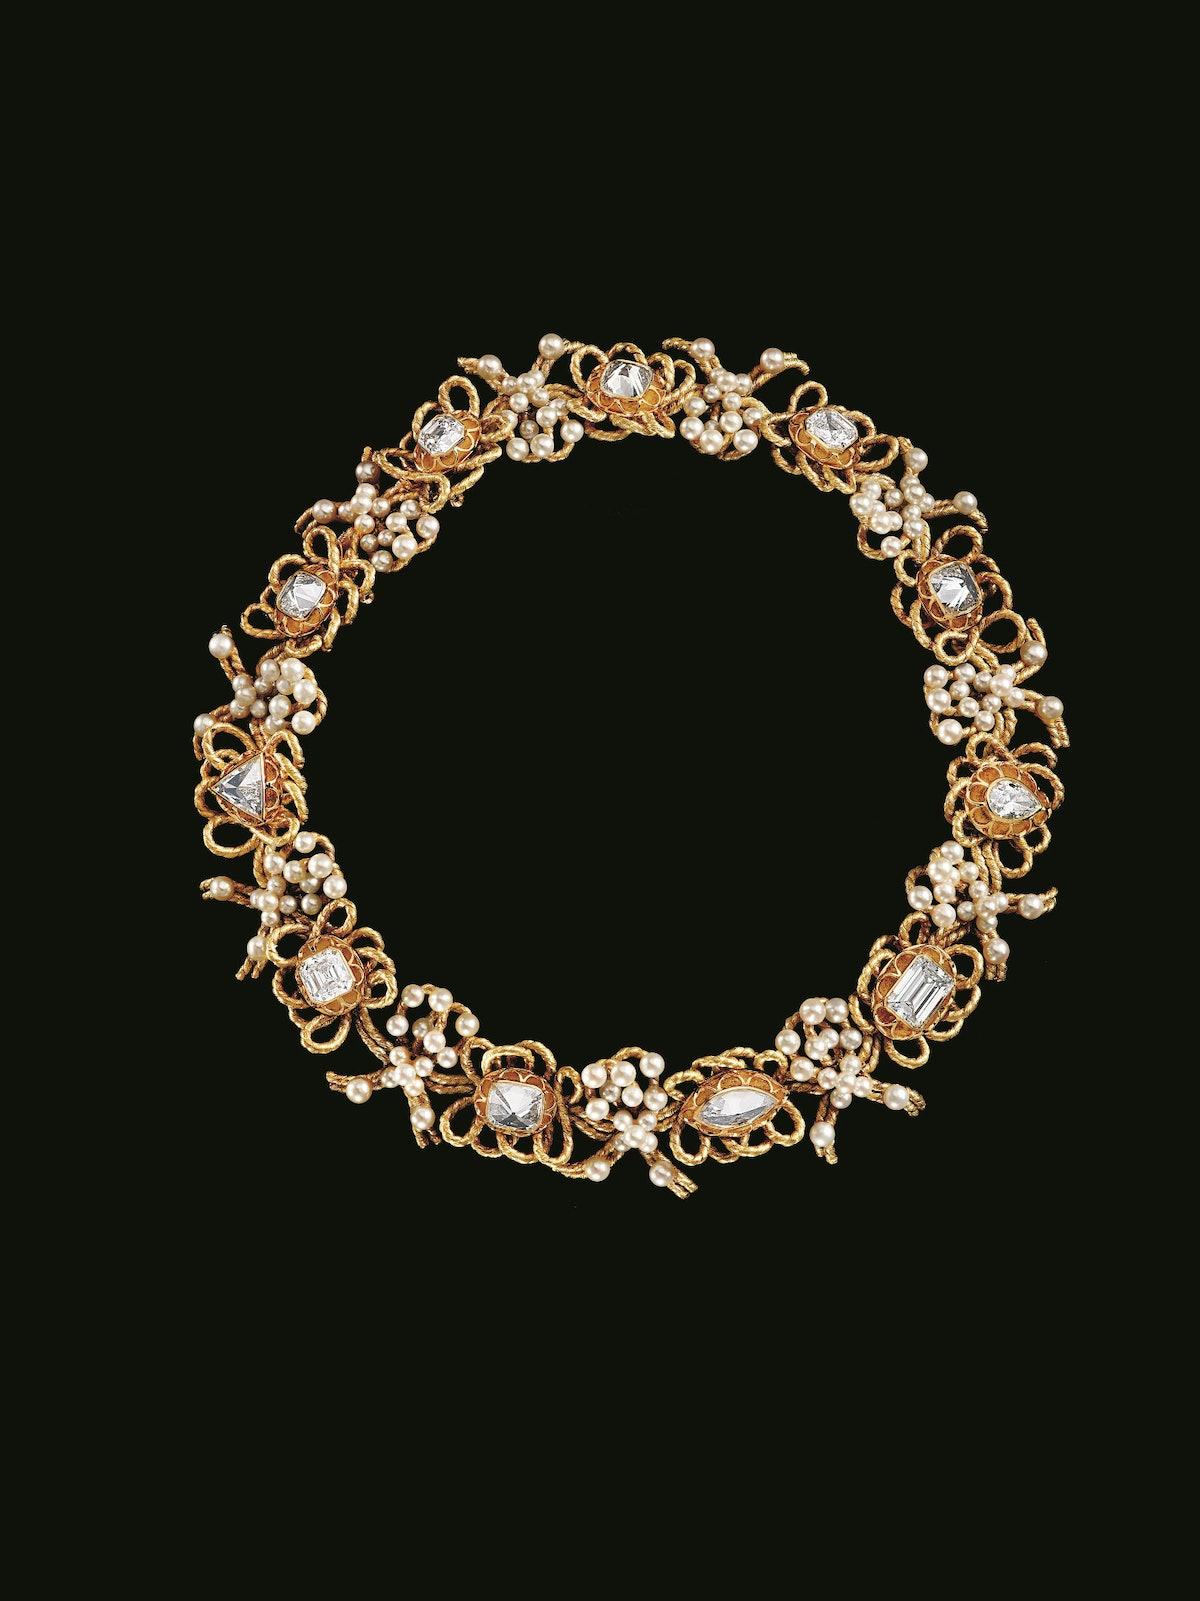 """Le Carcan"" gold and diamond necklace, 1983. Design by Alexandre Reza. Courtesy of Alexandre Reza."